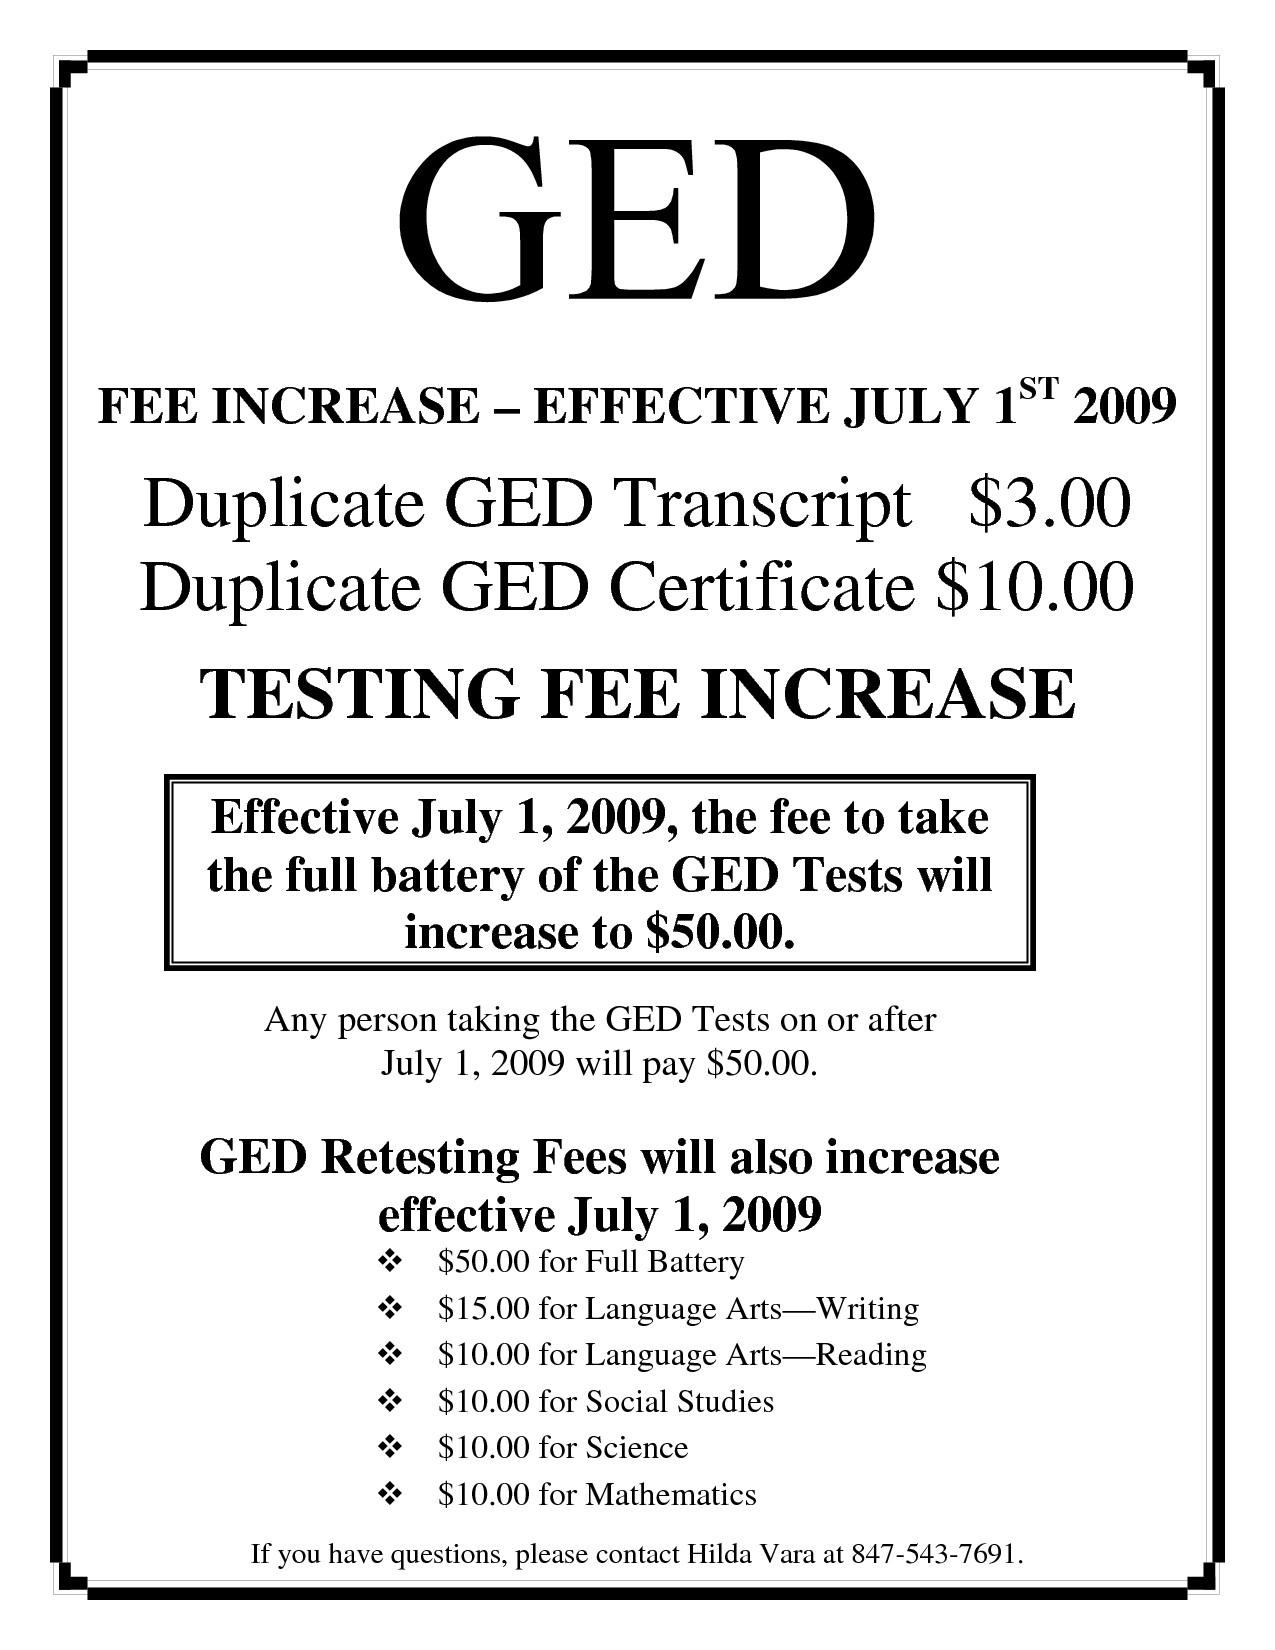 Printable Ged Certificate | Katieroseintimates - Free Printable Ged Transcripts